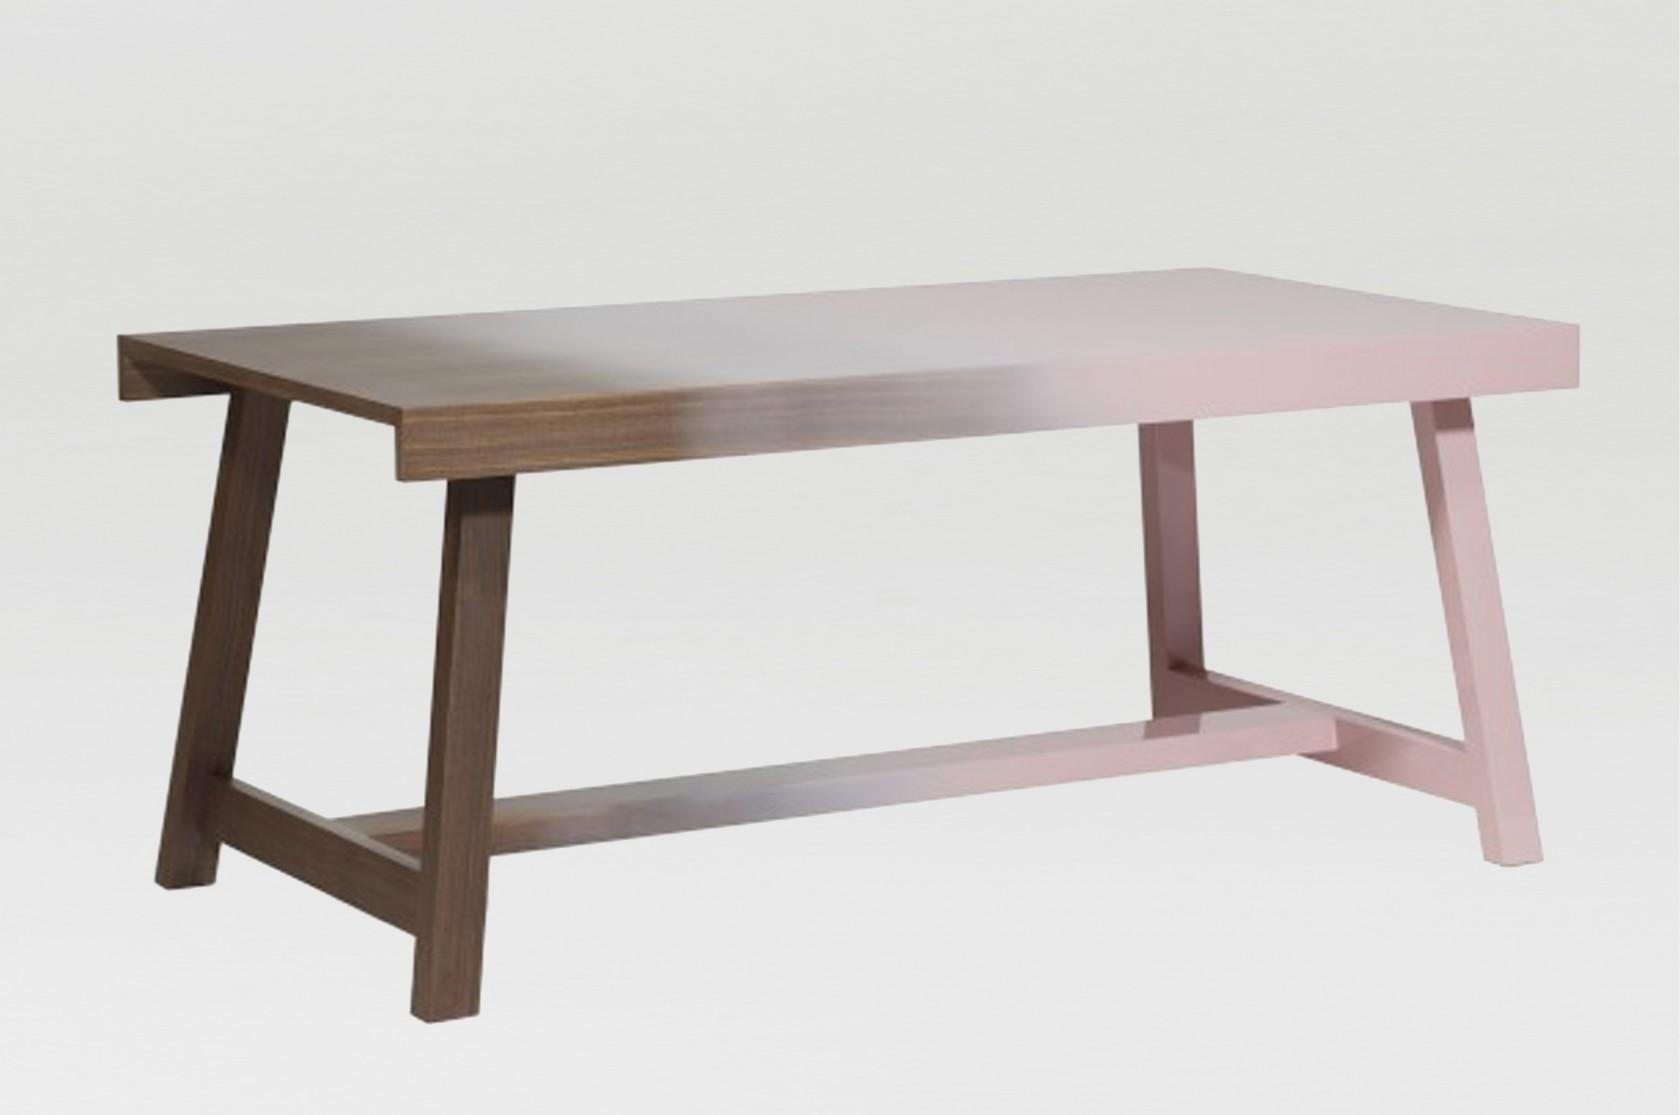 table niebla ludovic avenel b niste cr ateur paris. Black Bedroom Furniture Sets. Home Design Ideas